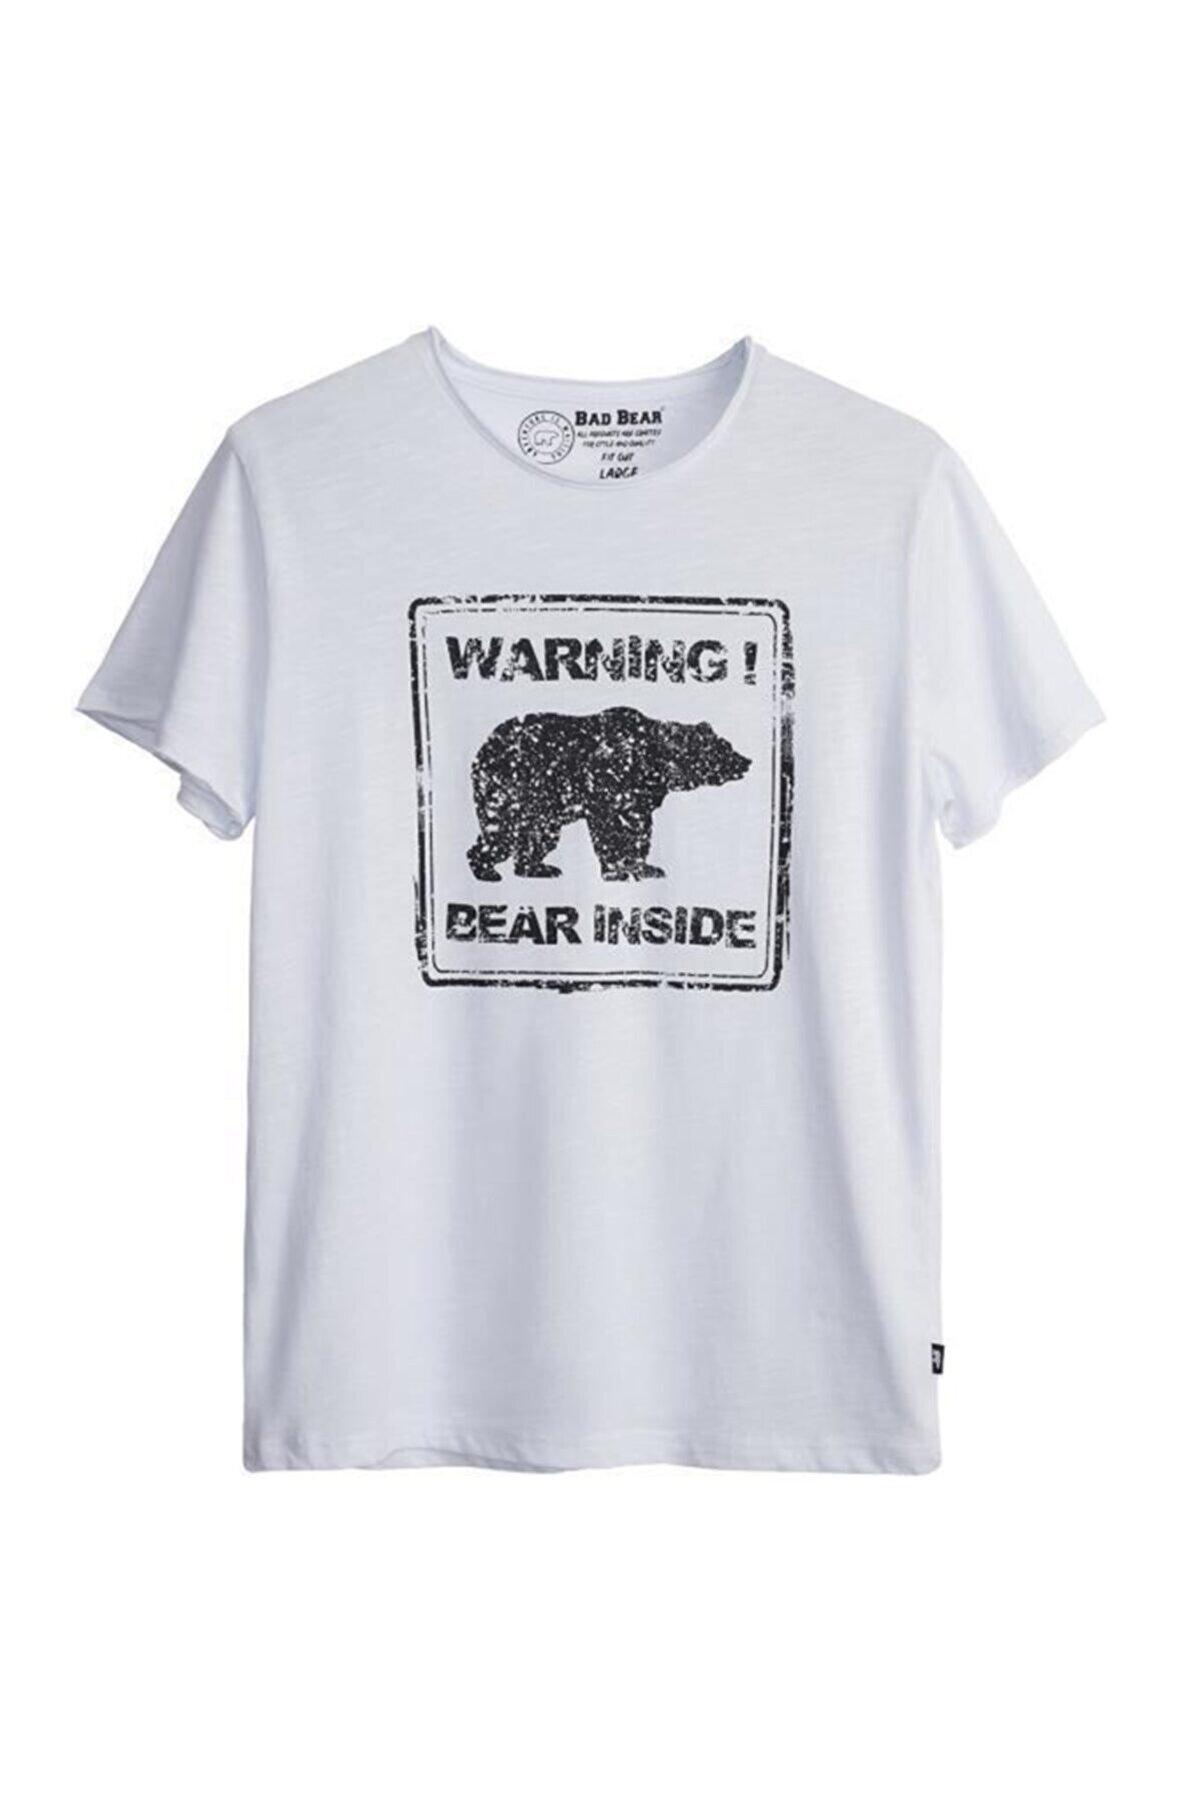 Bad Bear Erkek T-shirt Attentıon Tee